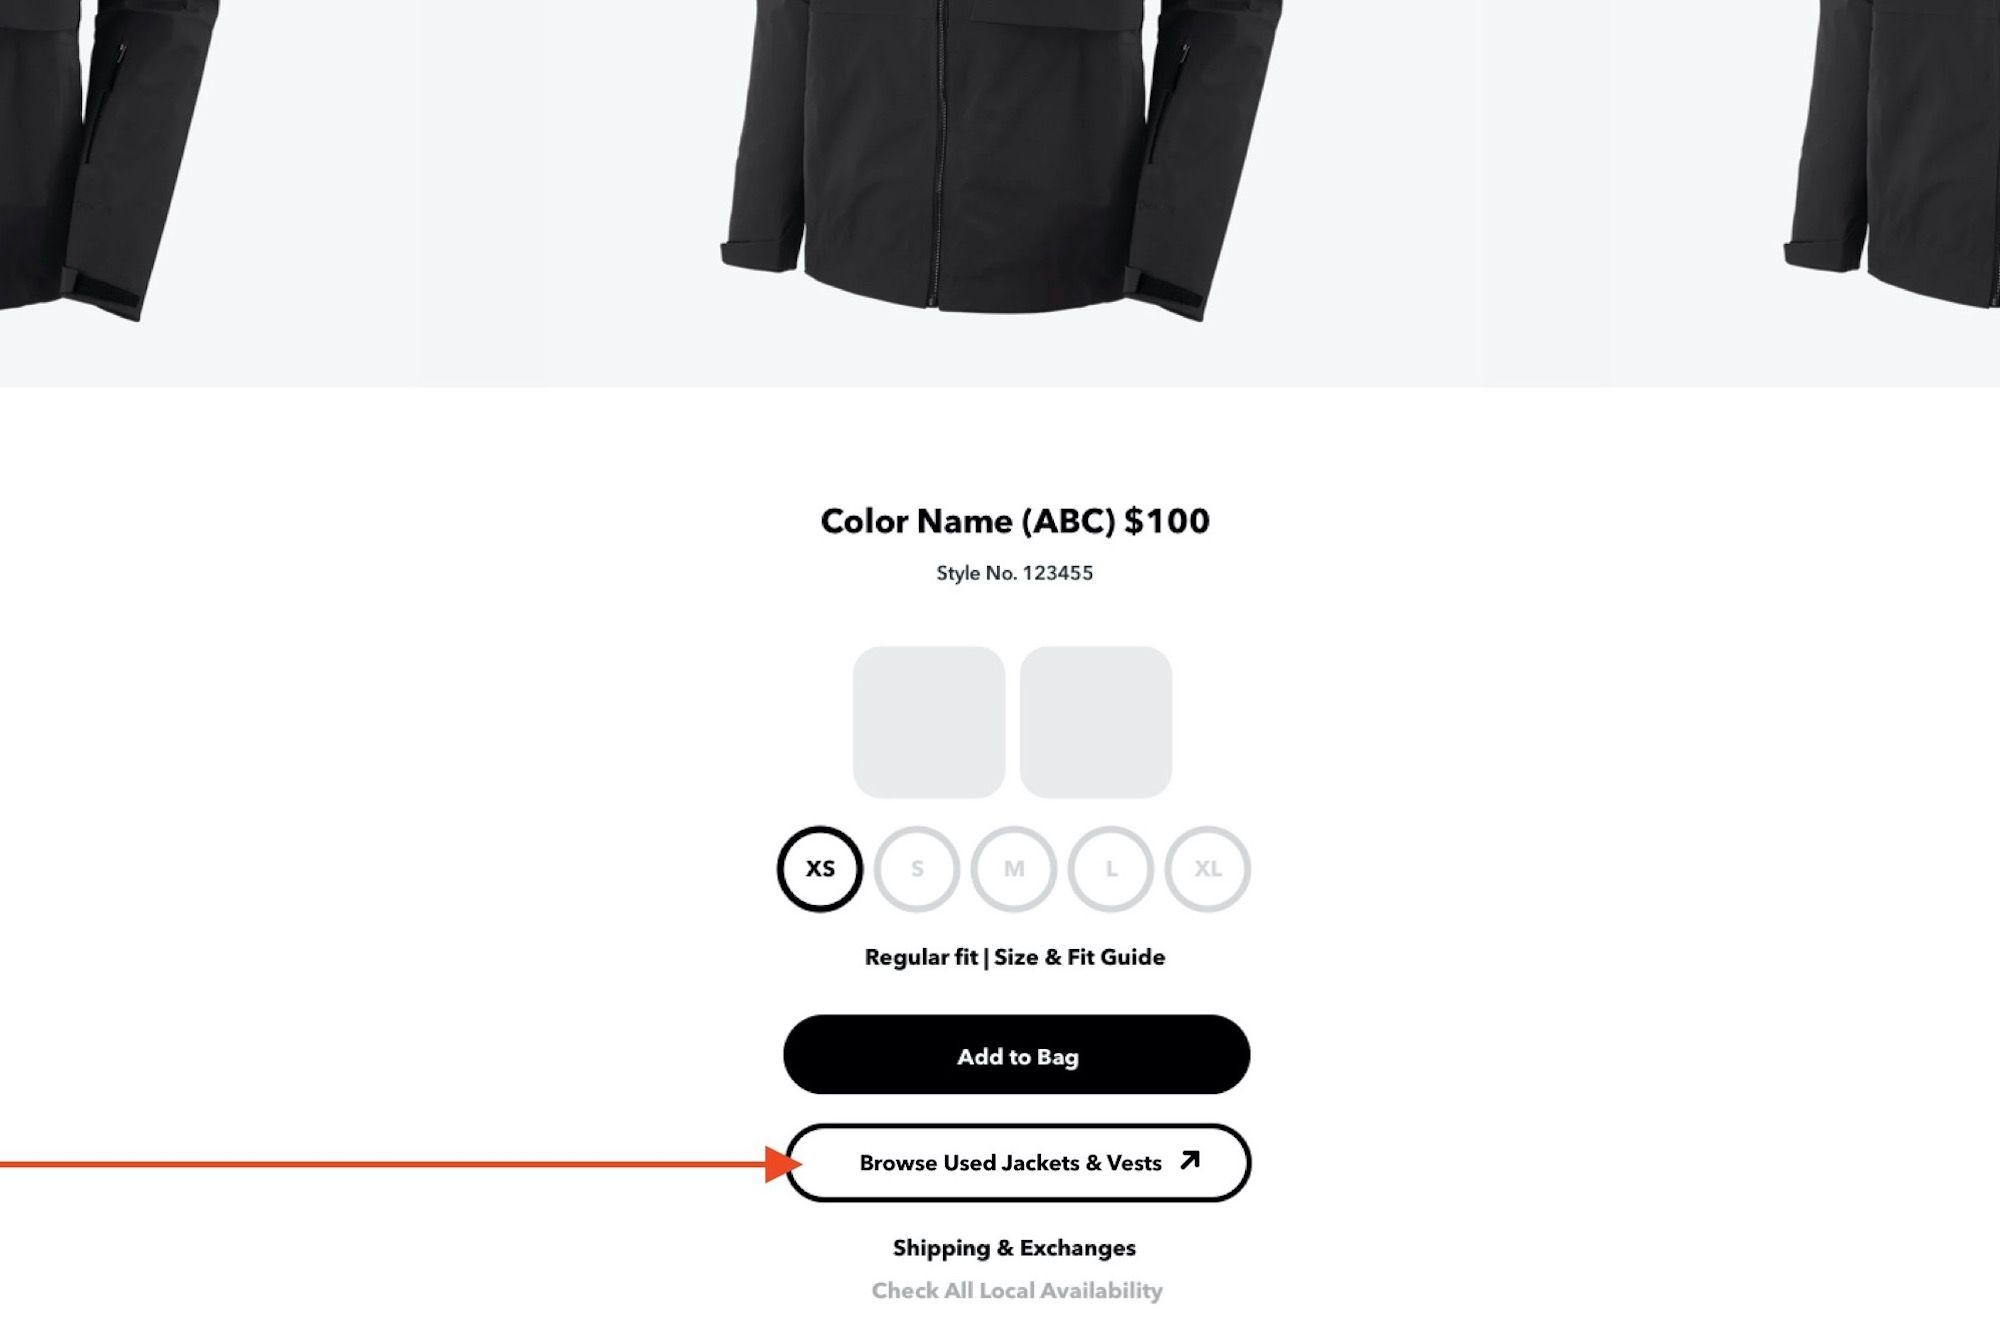 Patagonia Buy Used option